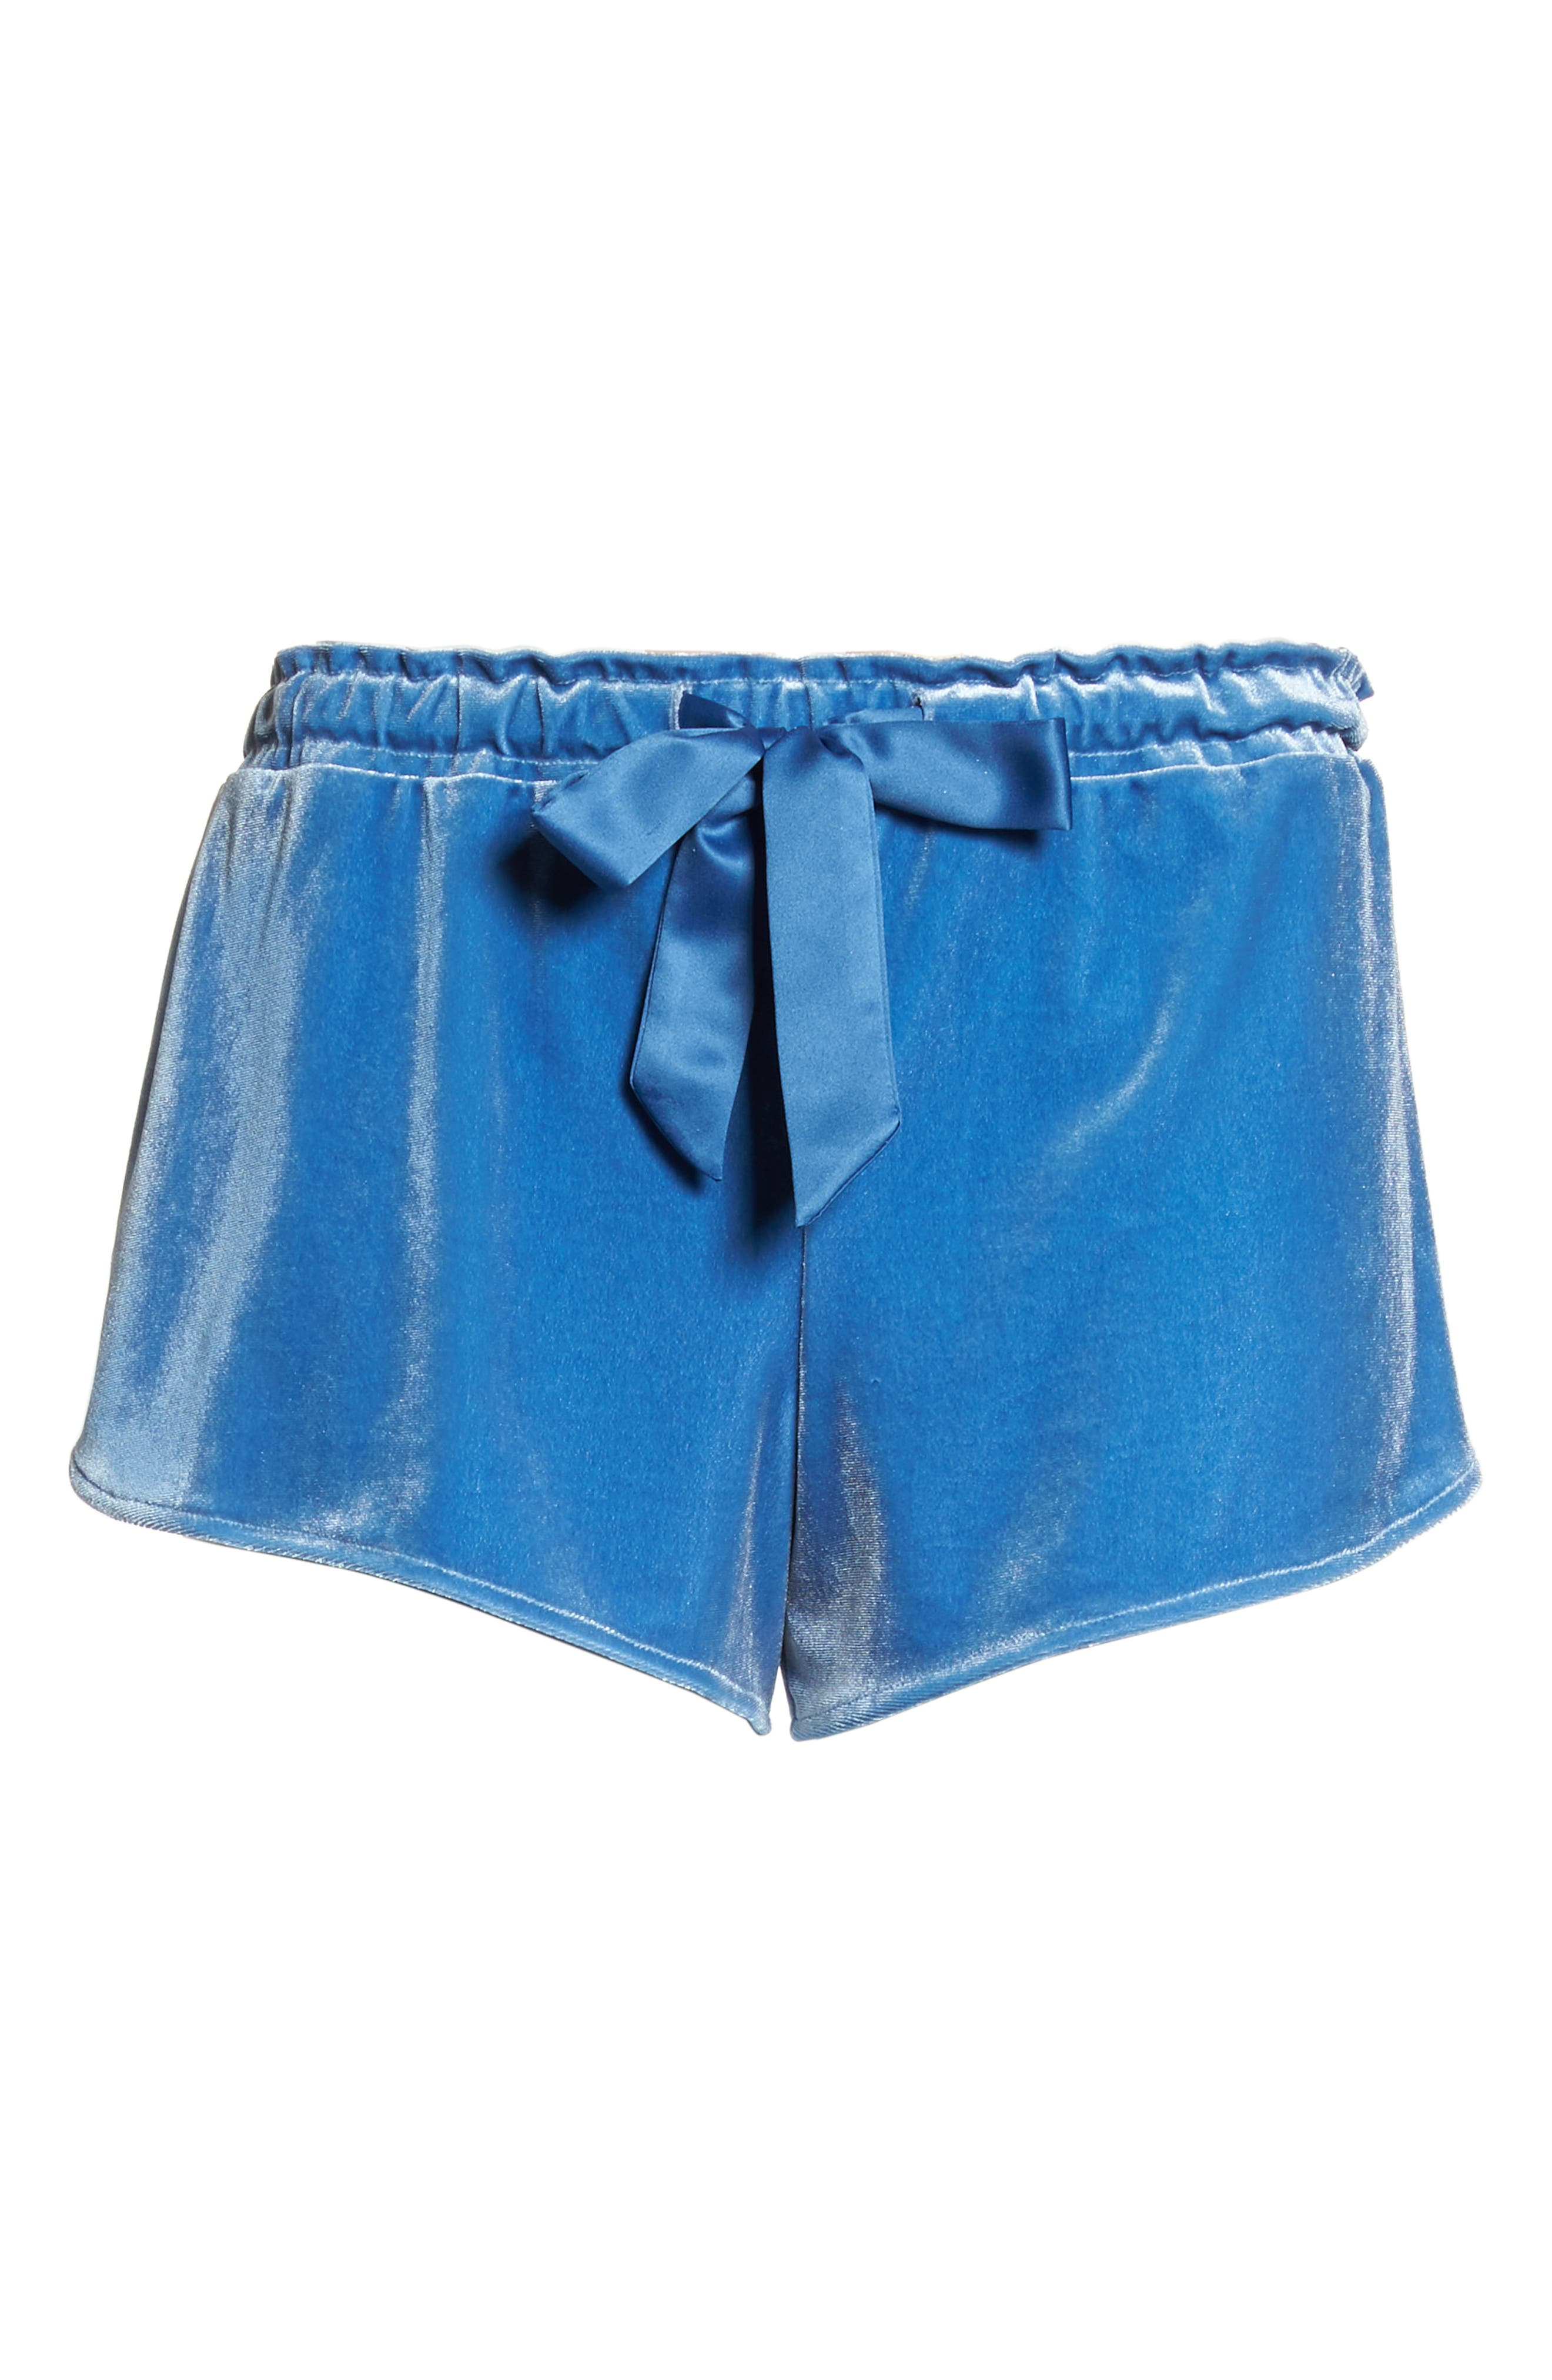 Starry Night Velvet Pajama Shorts,                             Alternate thumbnail 6, color,                             BLUE DELFT